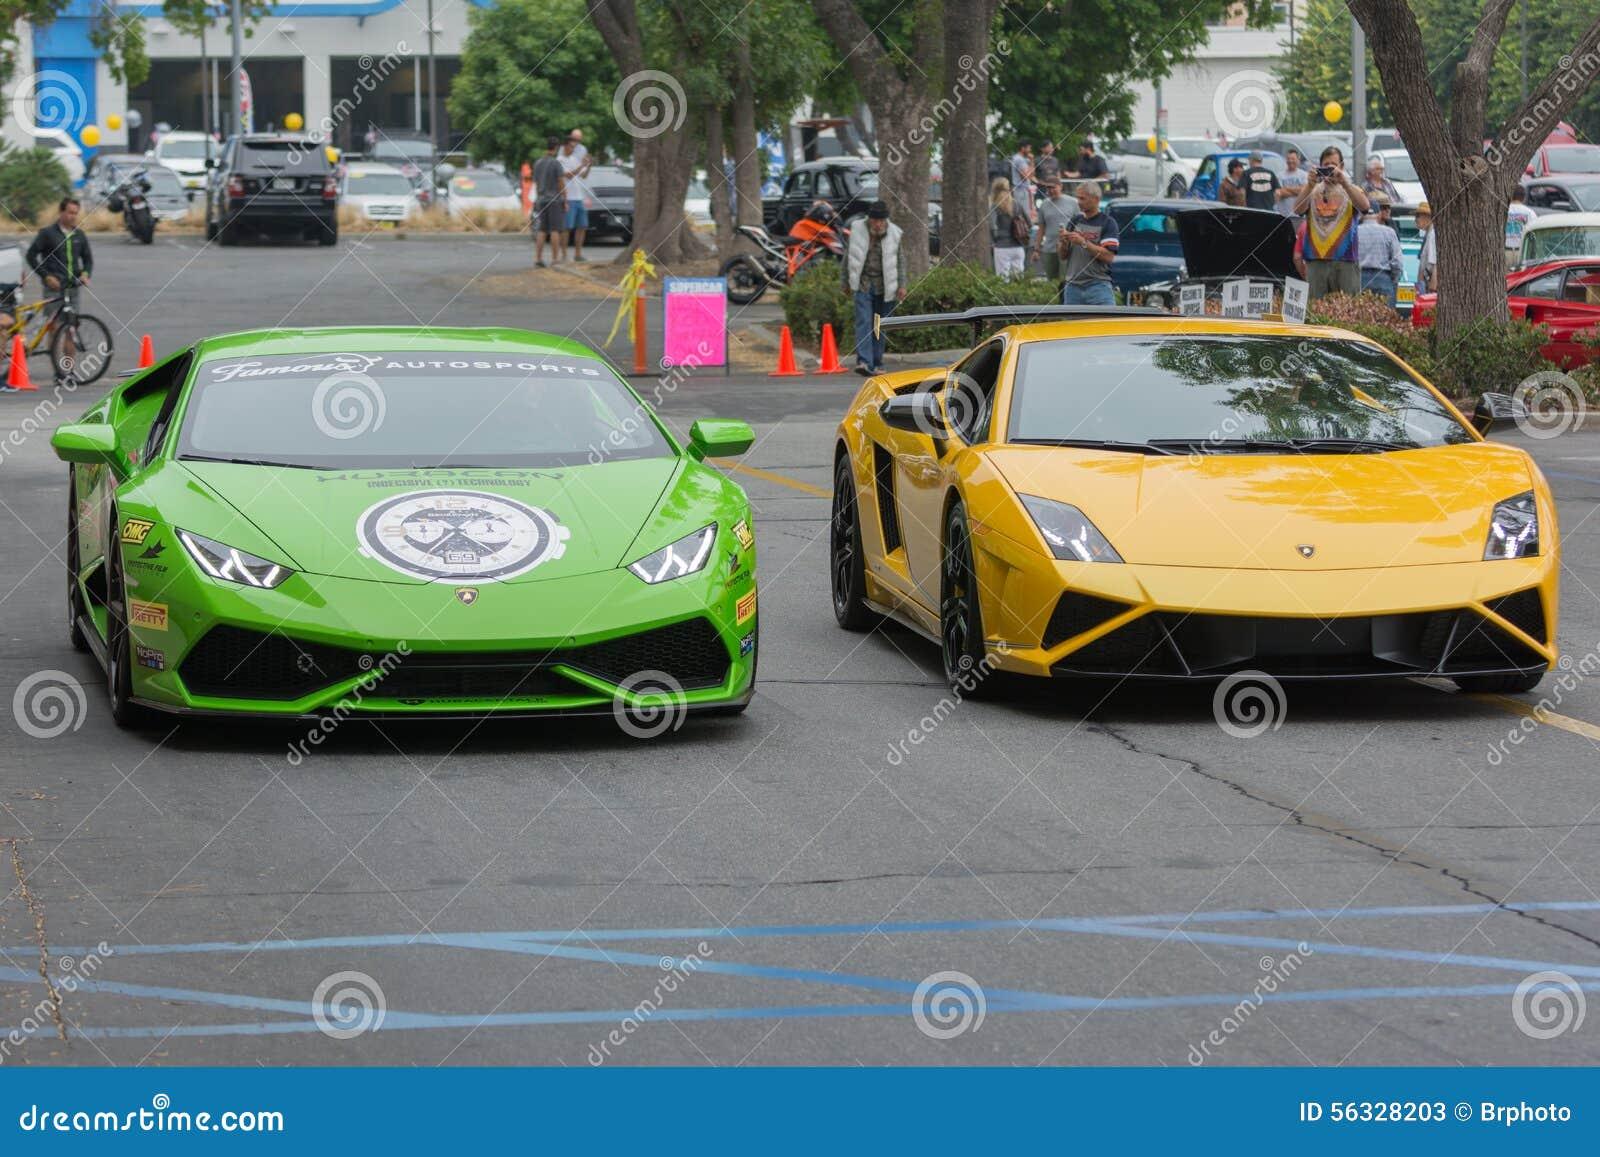 Lamborghini Huracan And Lamborghini Gallardo Car On Display